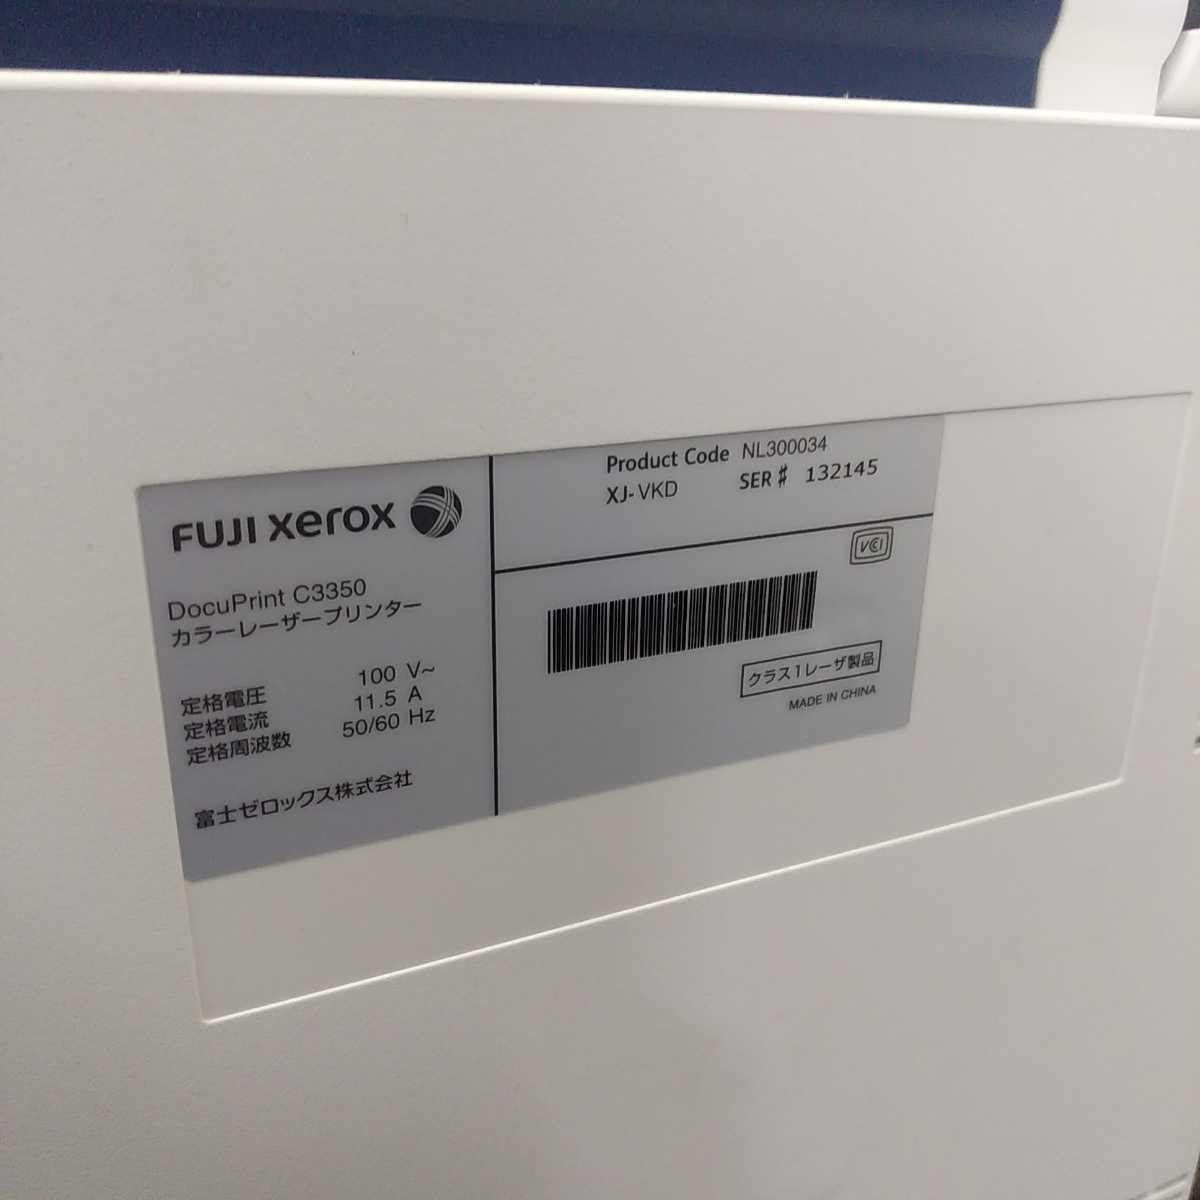 FUJI XEROX DocuPrint C3350 レーザープリンター 通電確認済み 現状品 プリンター 格安売り切りスタート☆_画像6